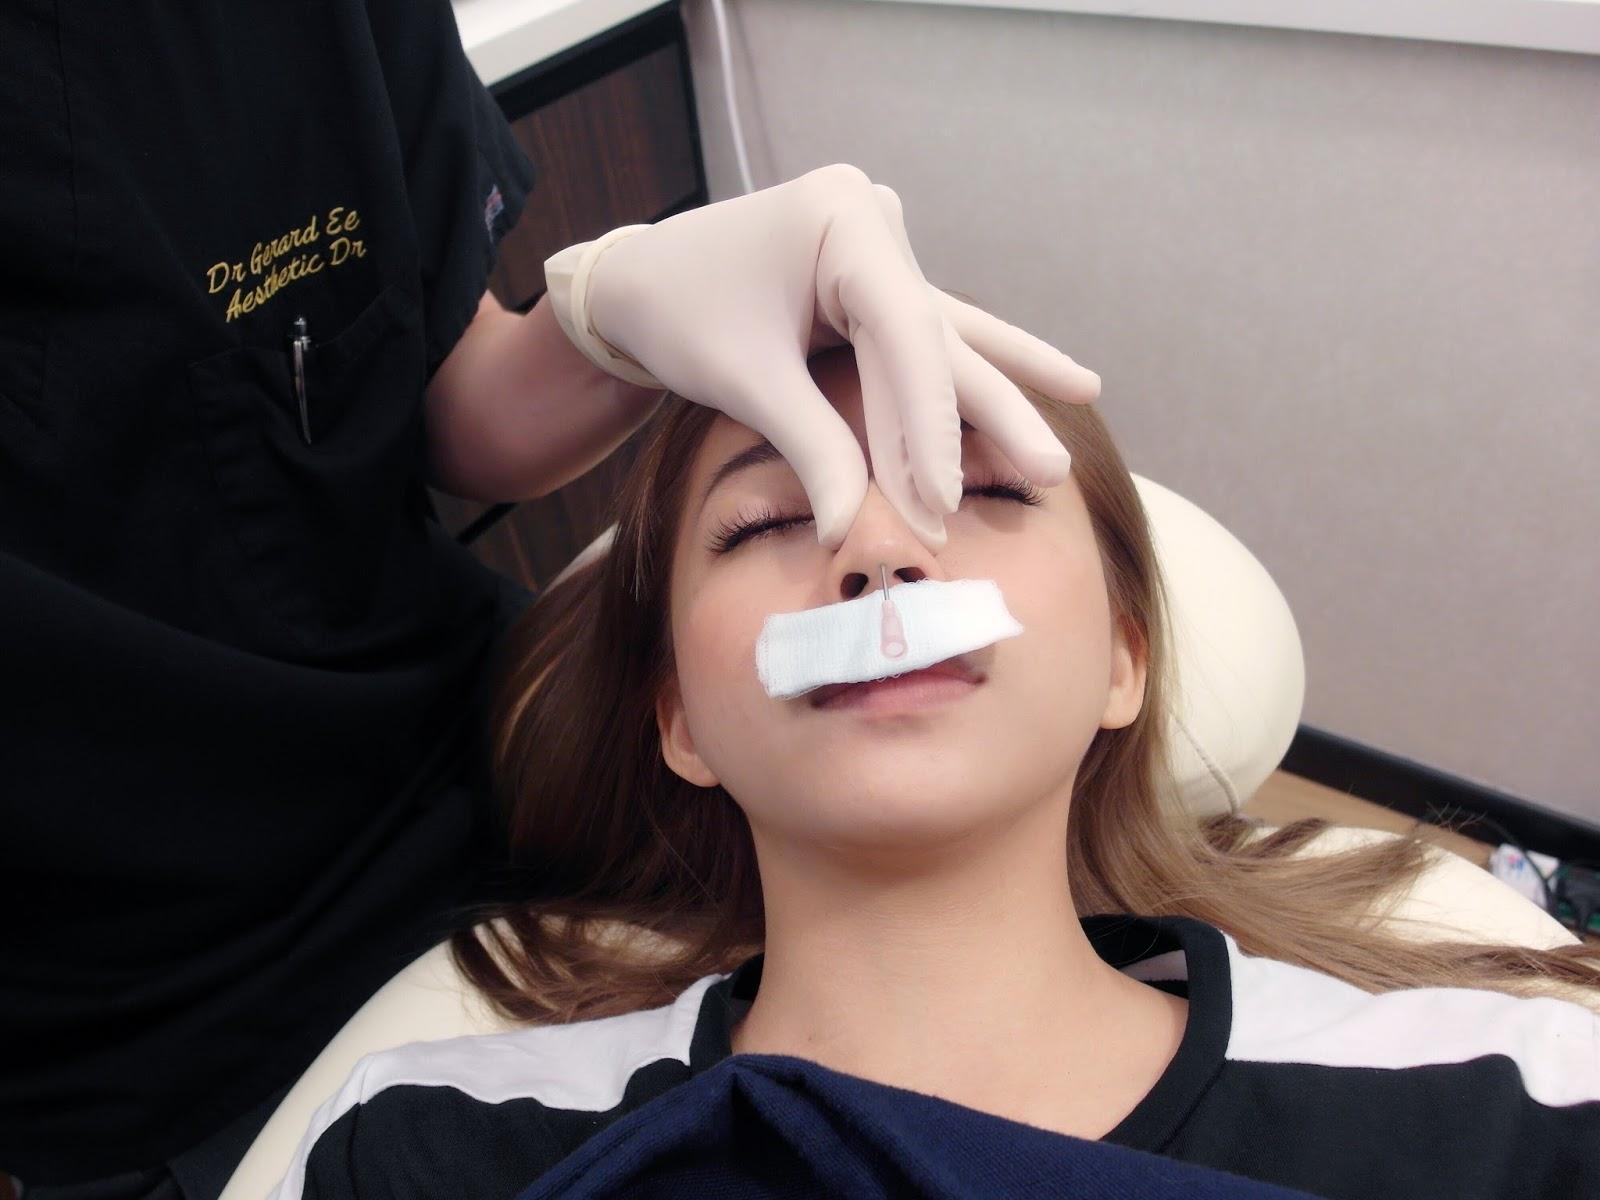 Petiteksf: Ultra V Hiko Nose thread lift at The Clifford Clinic!